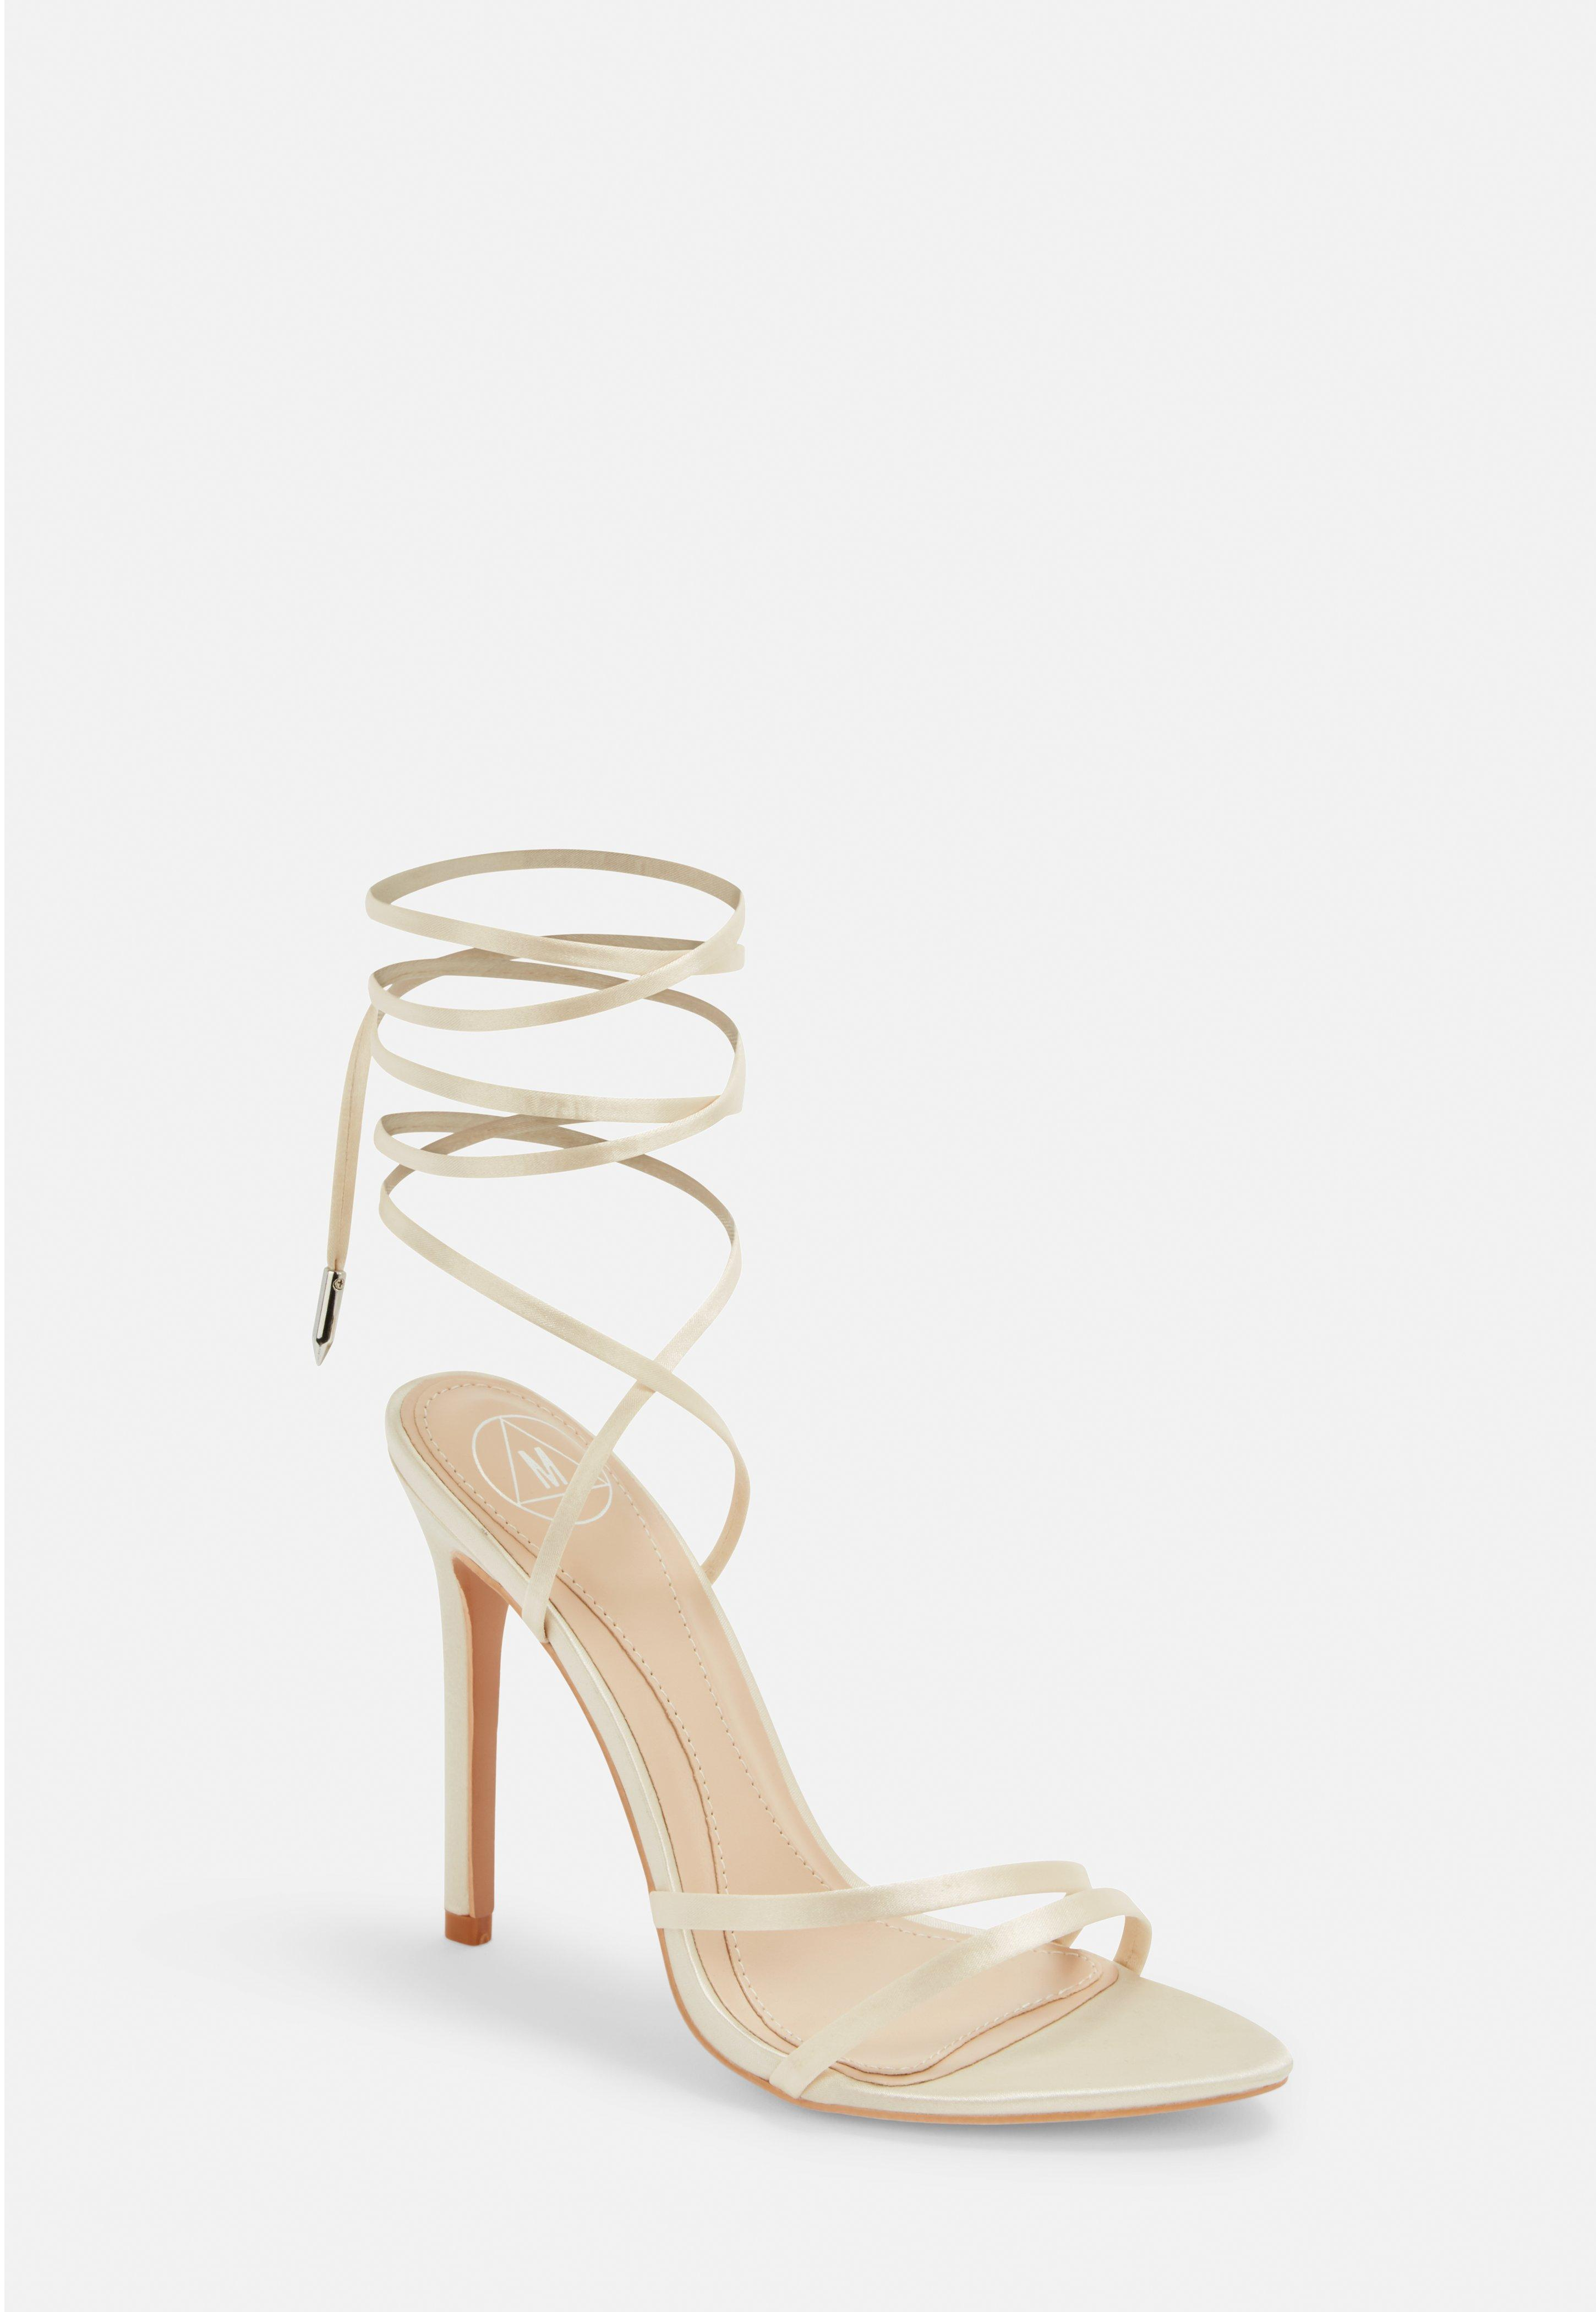 d3e6db32ca7253 Chaussure femme